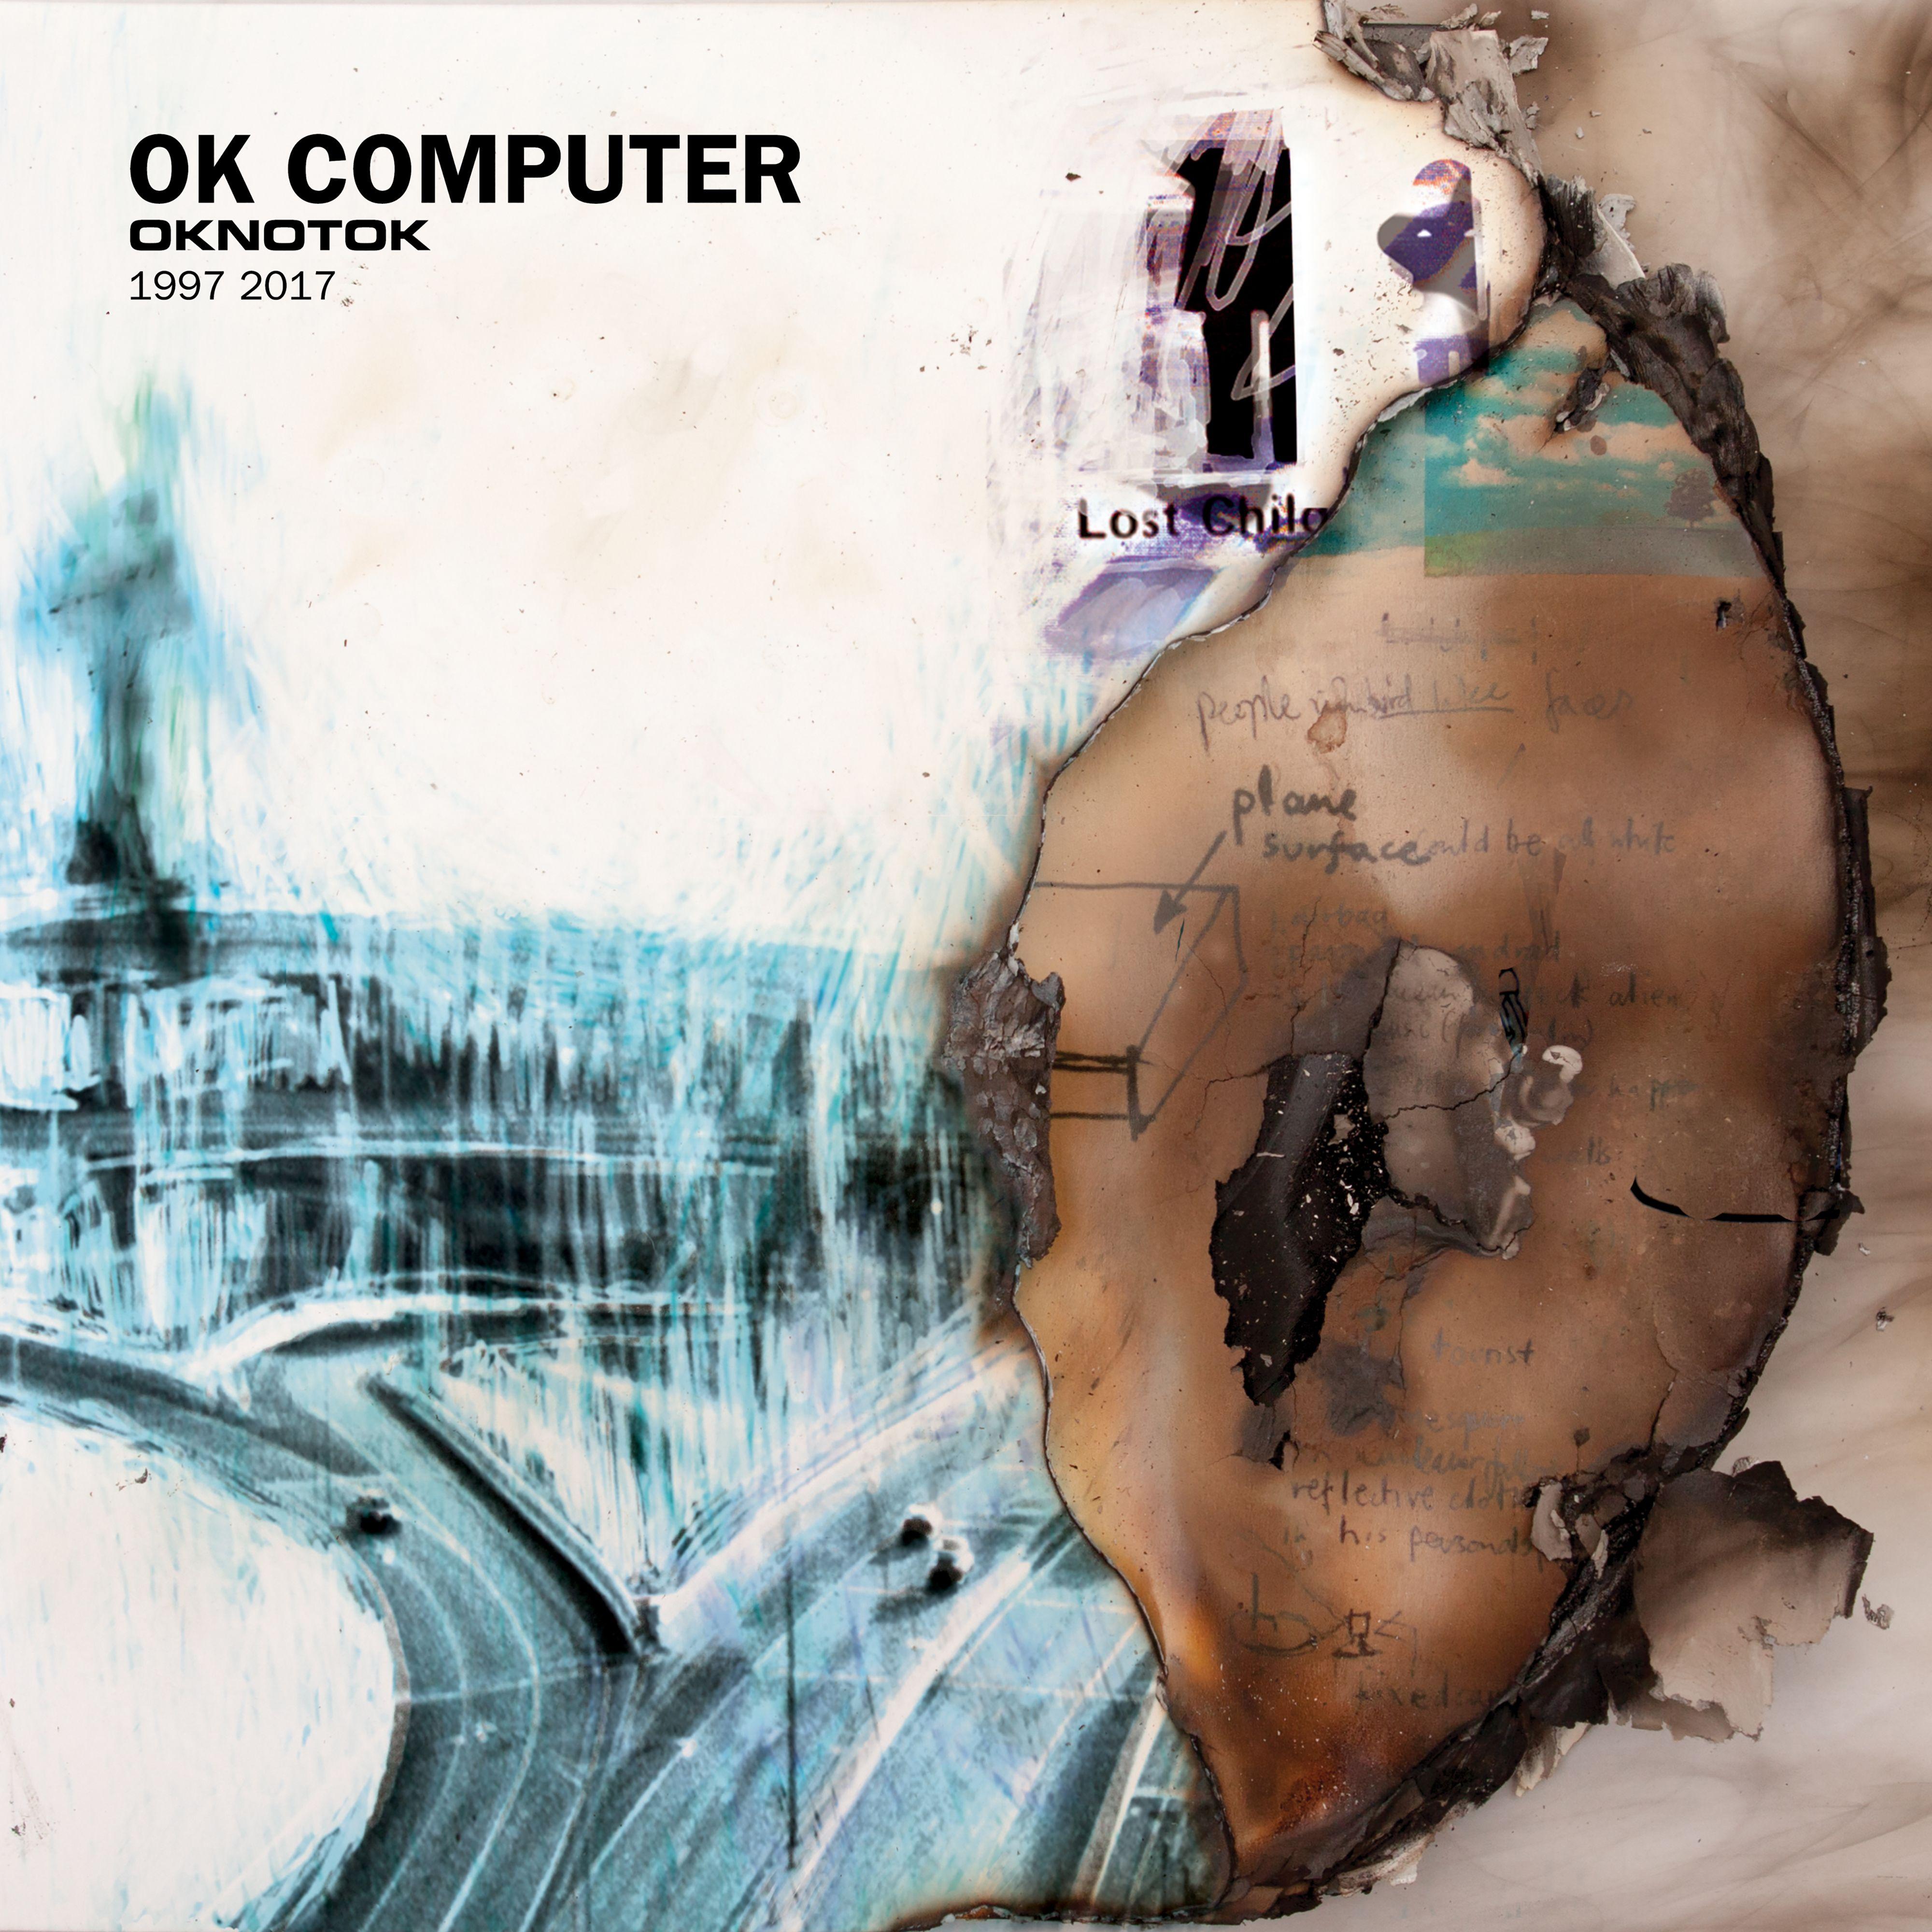 Radiohead - OK Computer:OKNOTOK 1997-2017 album cover